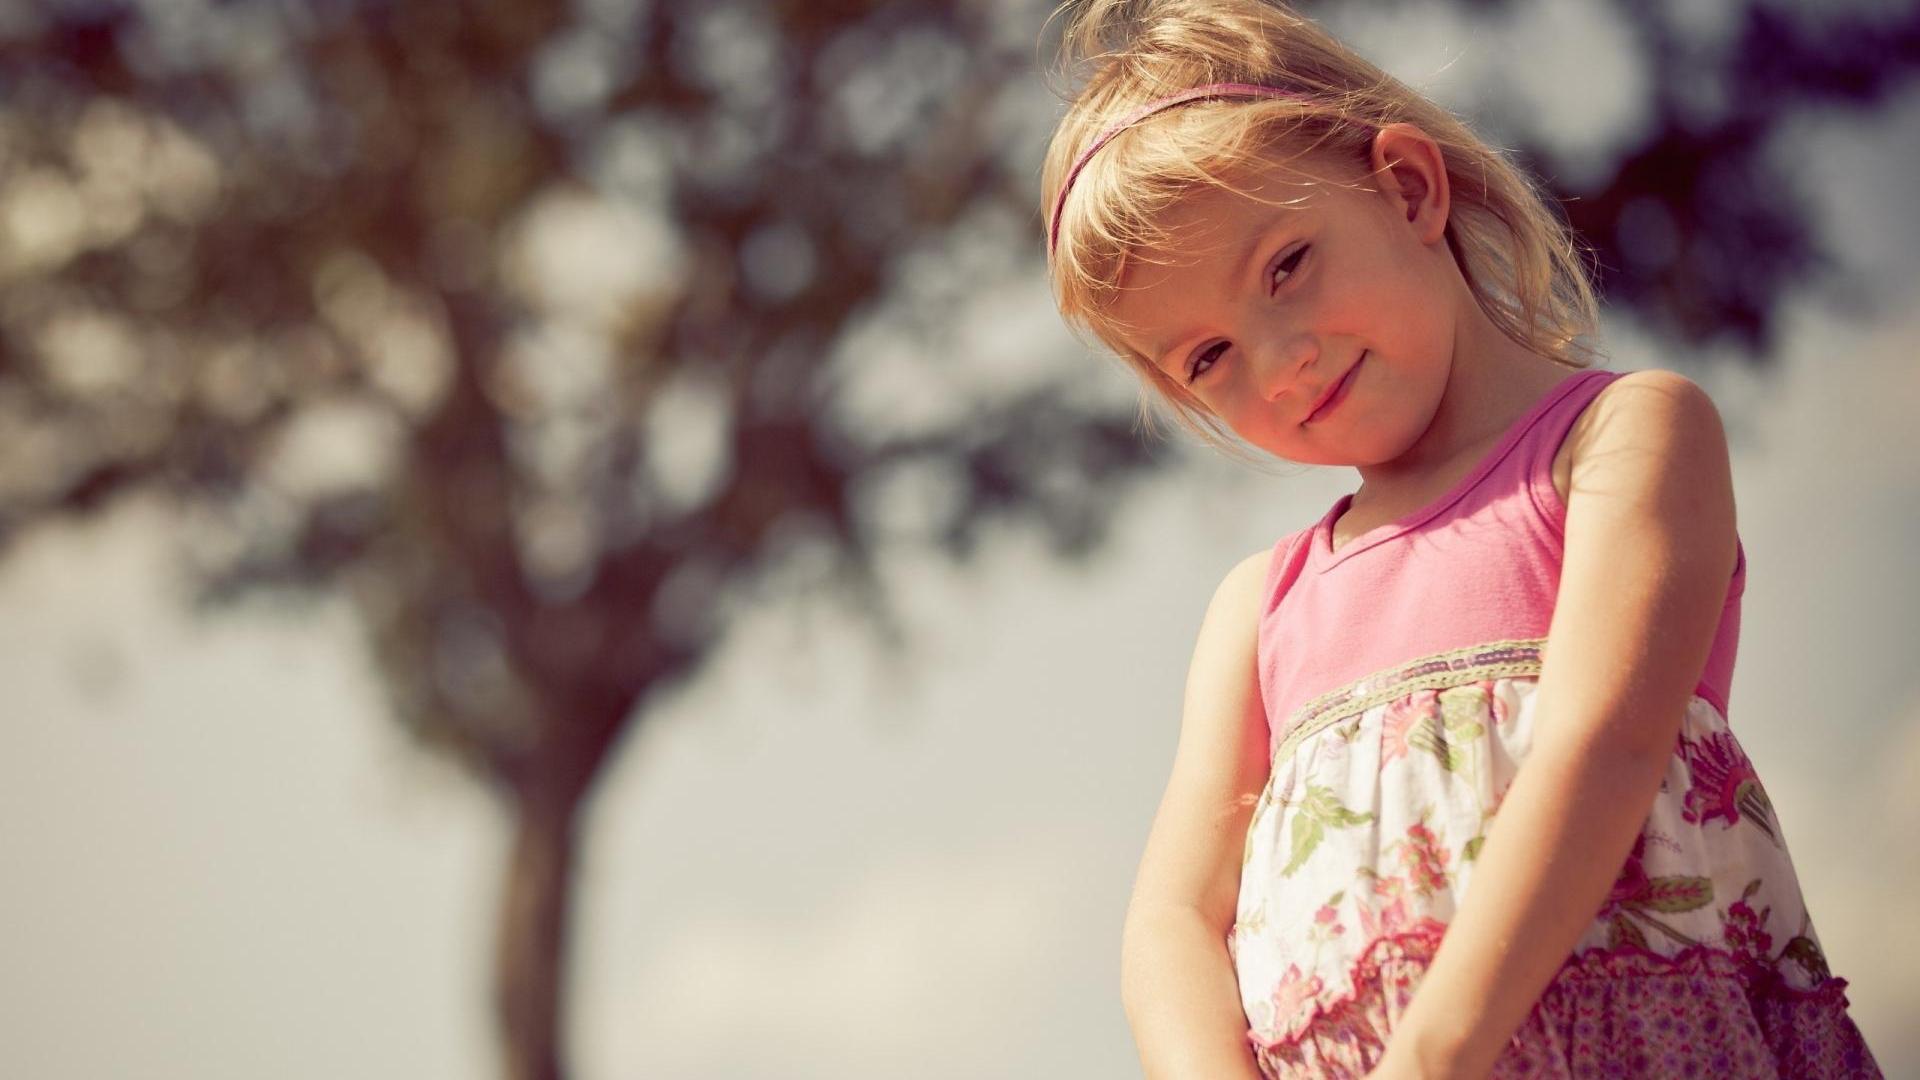 Cute Baby Girl Wallpaper Hd Download For Desktop Mobile 1920x1080